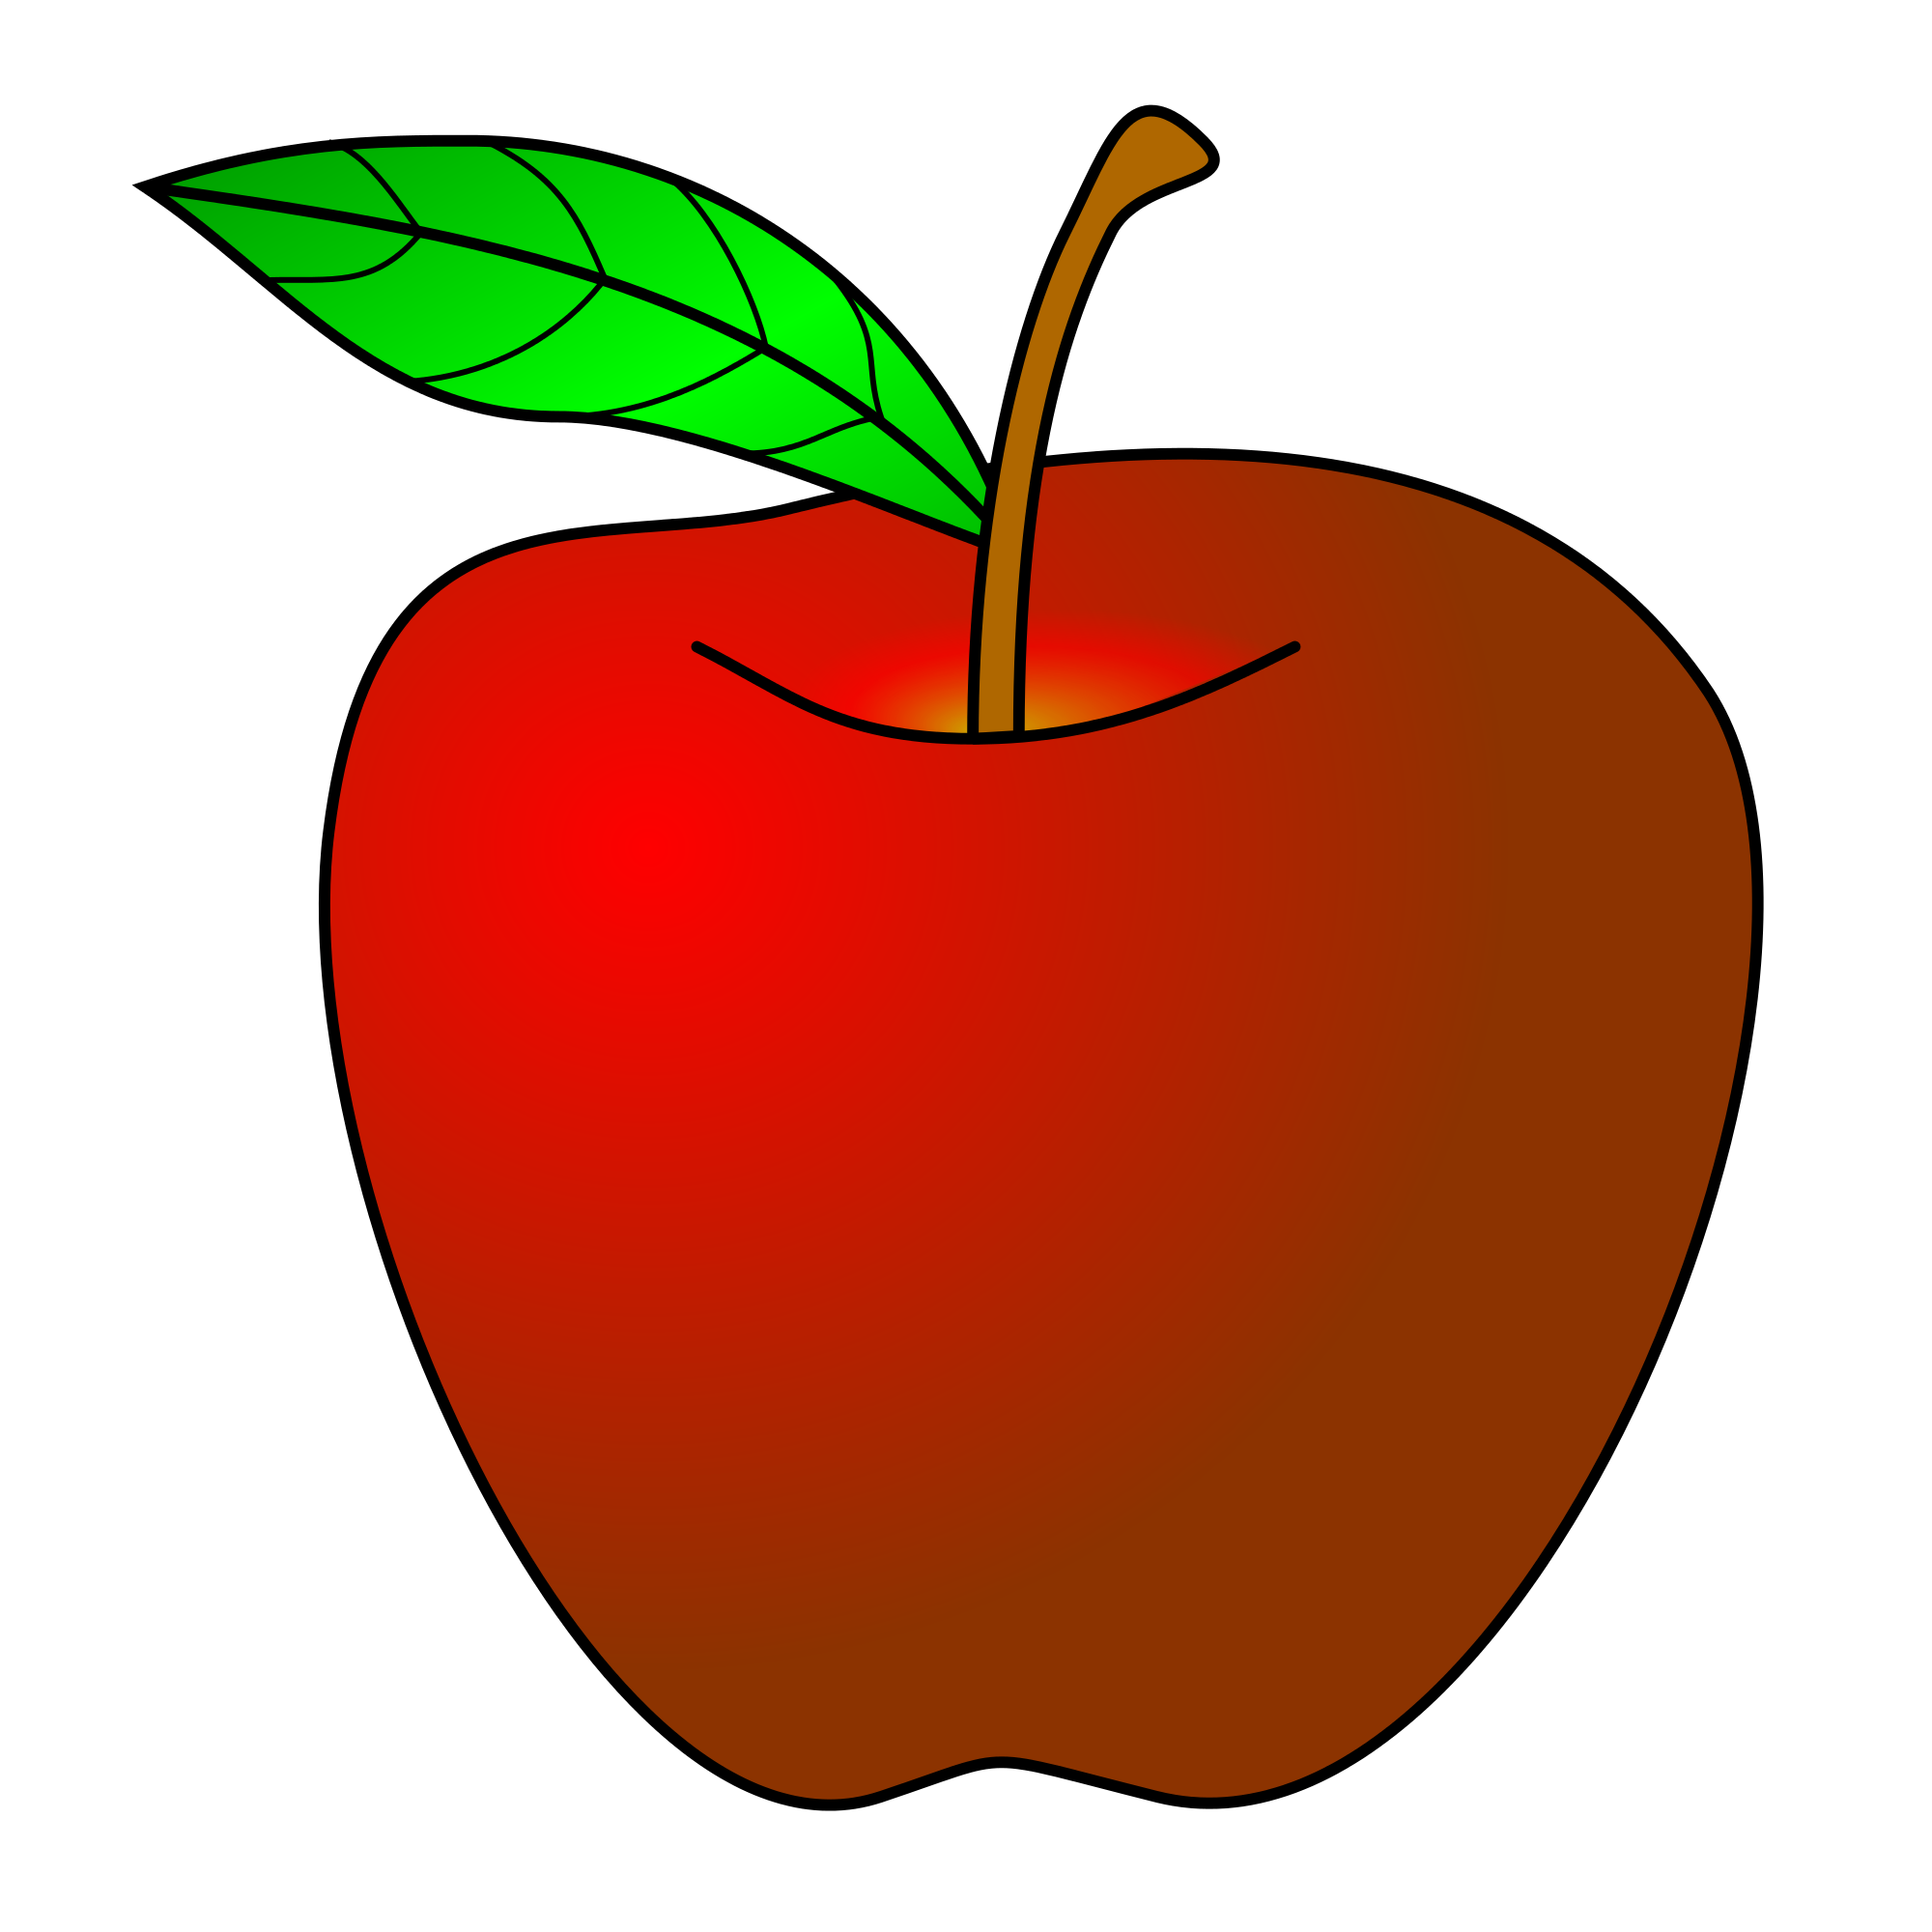 Clipart apple template, Clipart apple template Transparent.